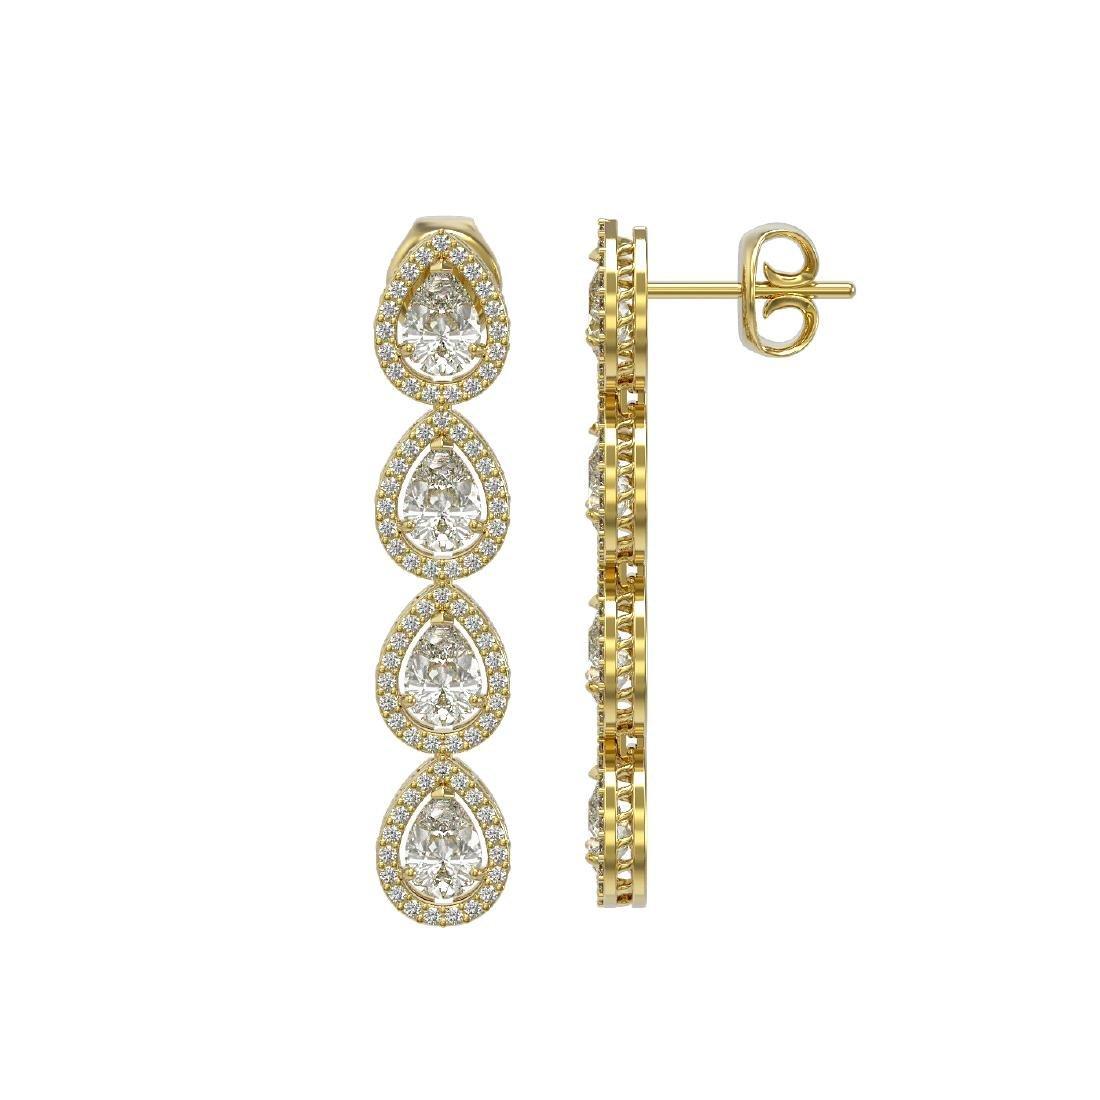 5.22 CTW Pear Diamond Designer Earrings 18K Yellow Gold - 2